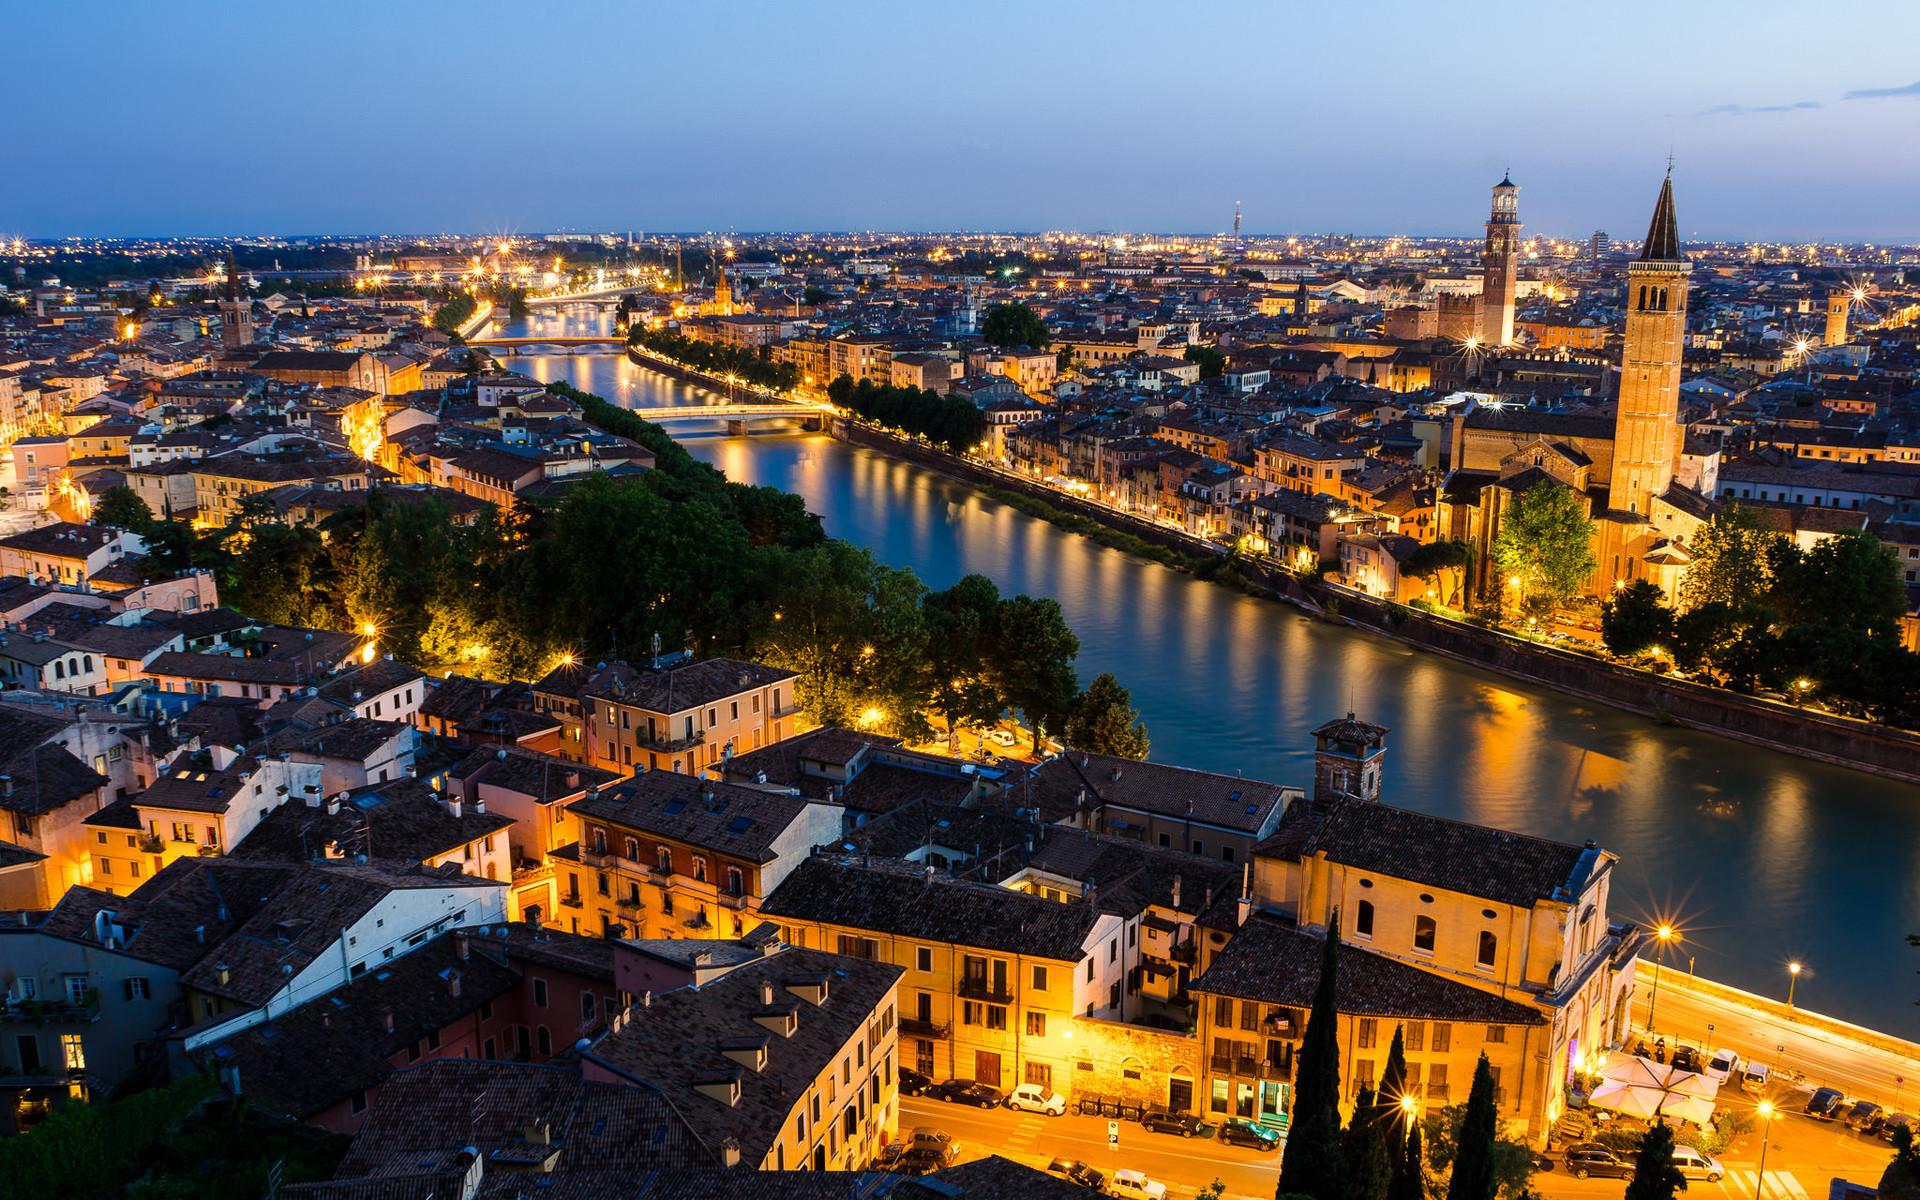 University of Verona, Italy | What to do in Verona